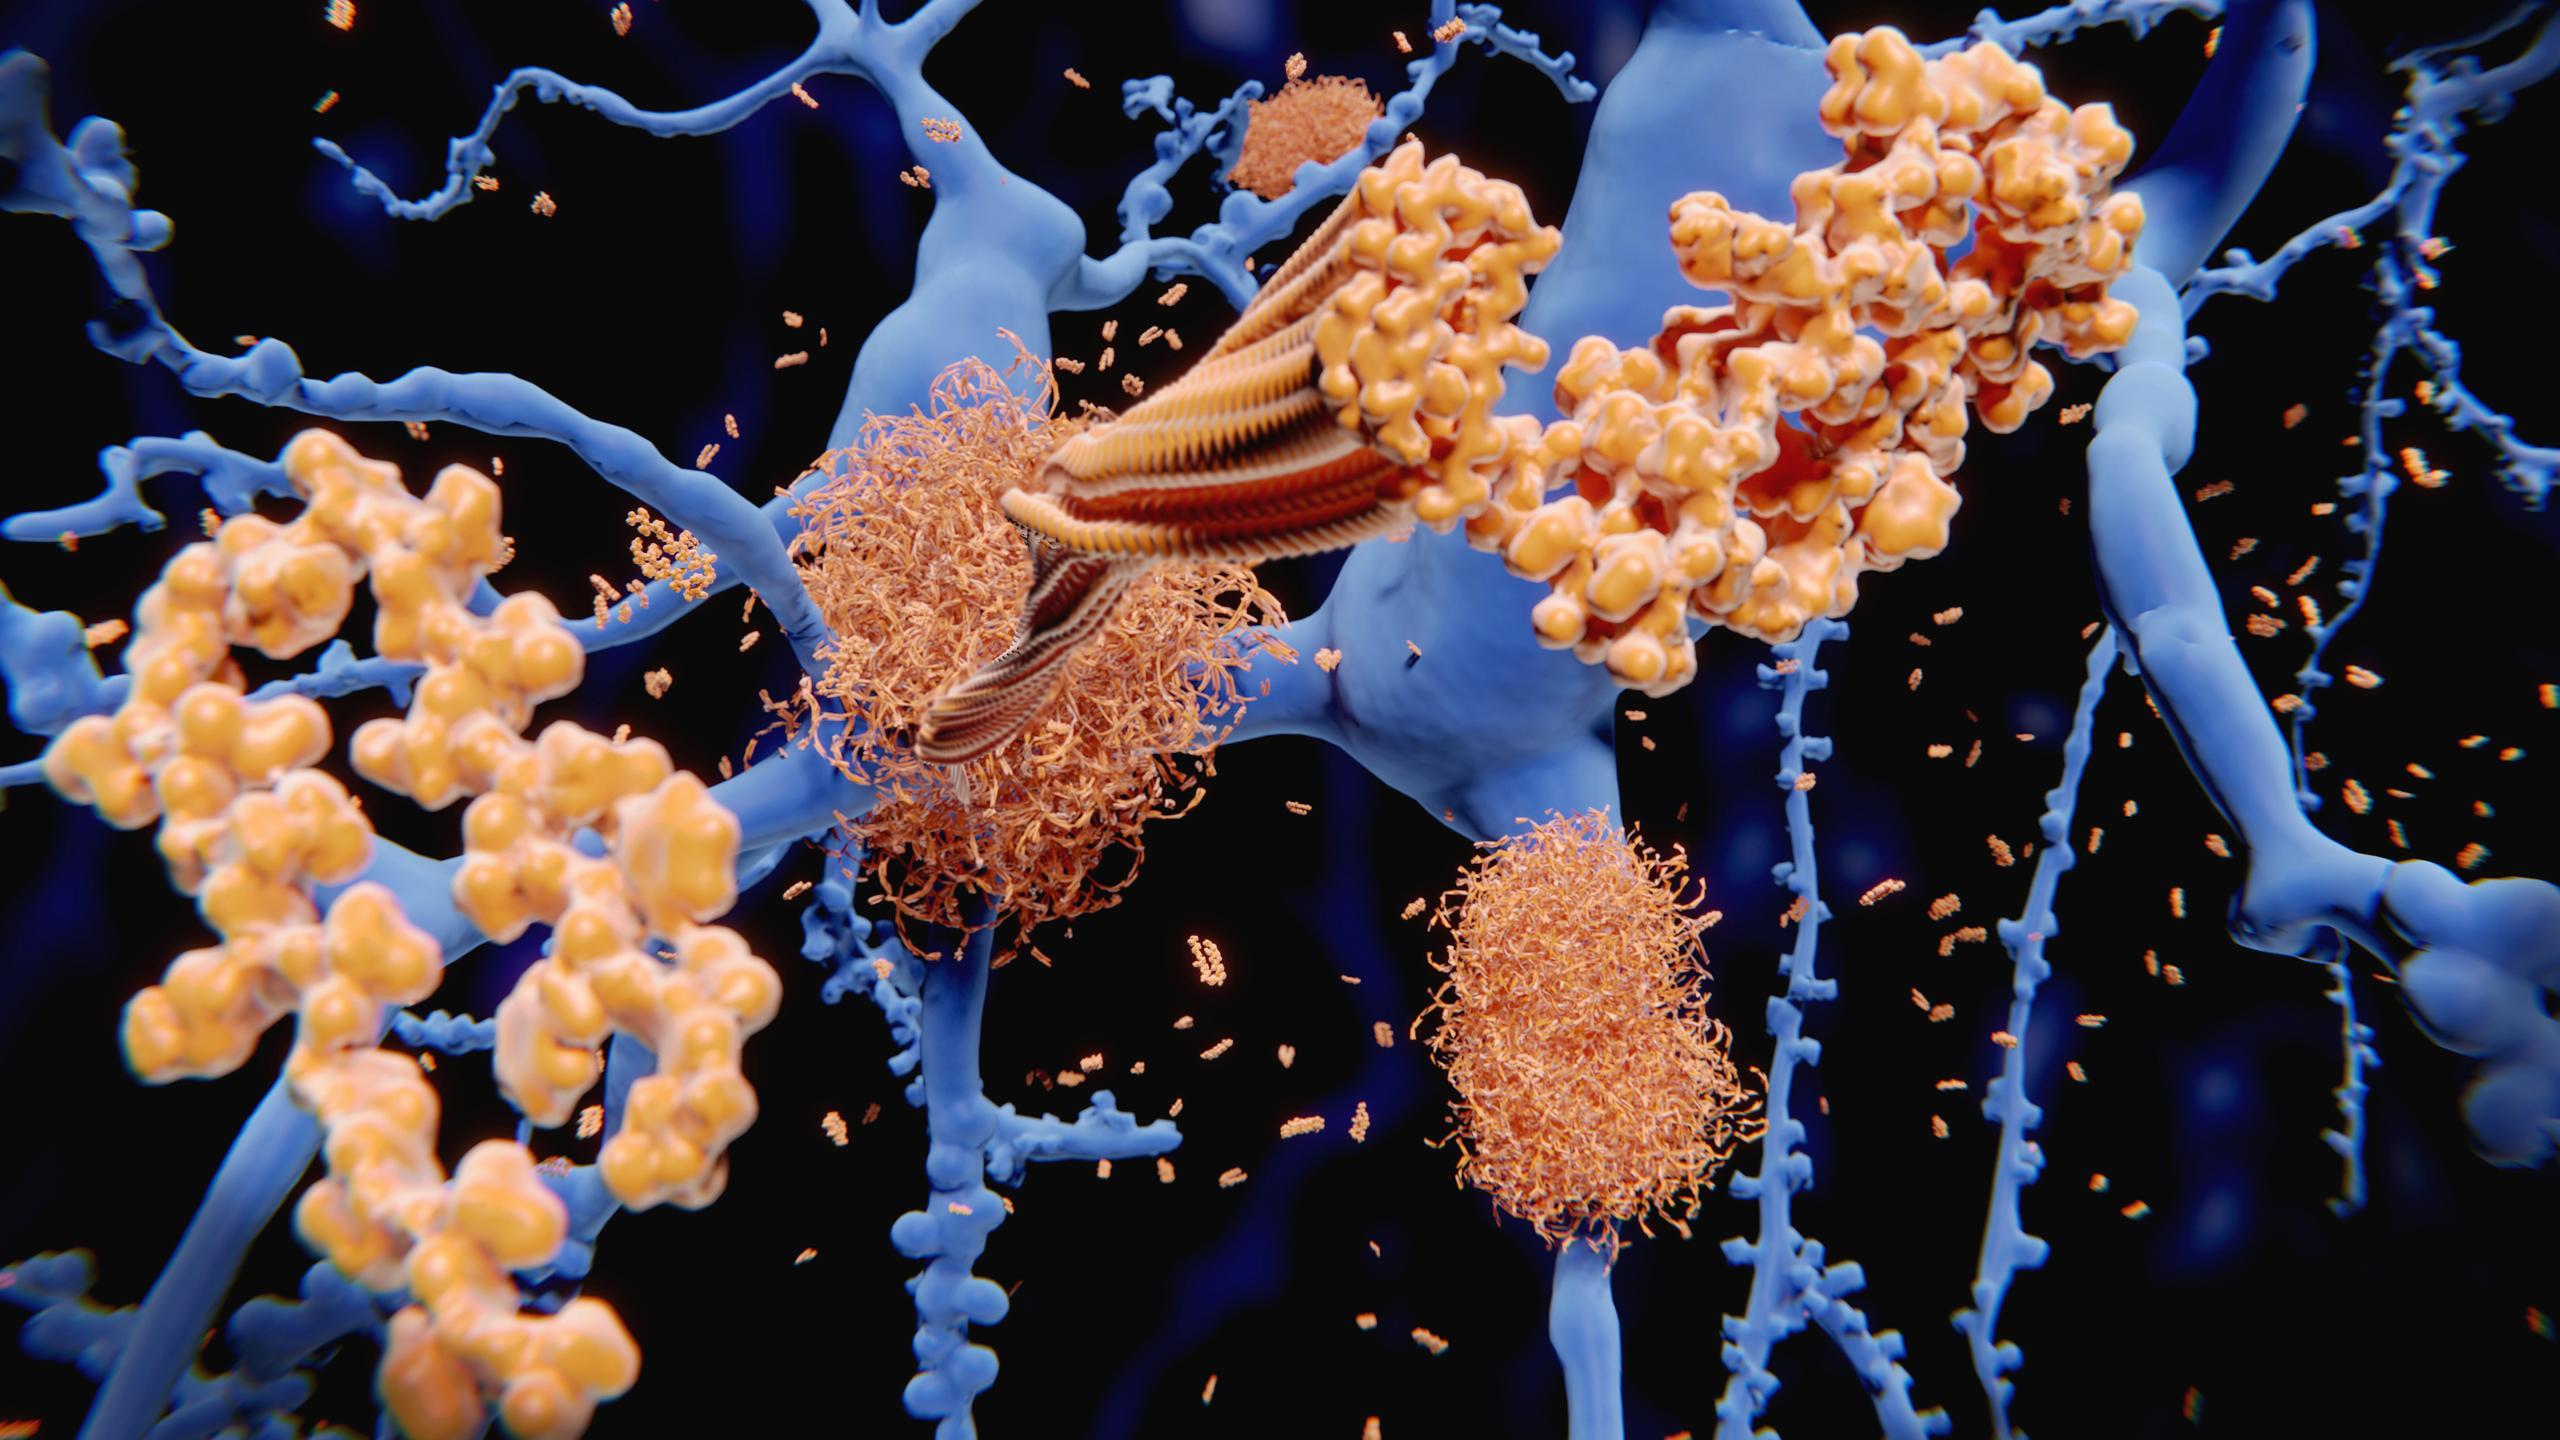 Нейрофизиологи описали механизм образования бета-амилоида под влиянием холестерина